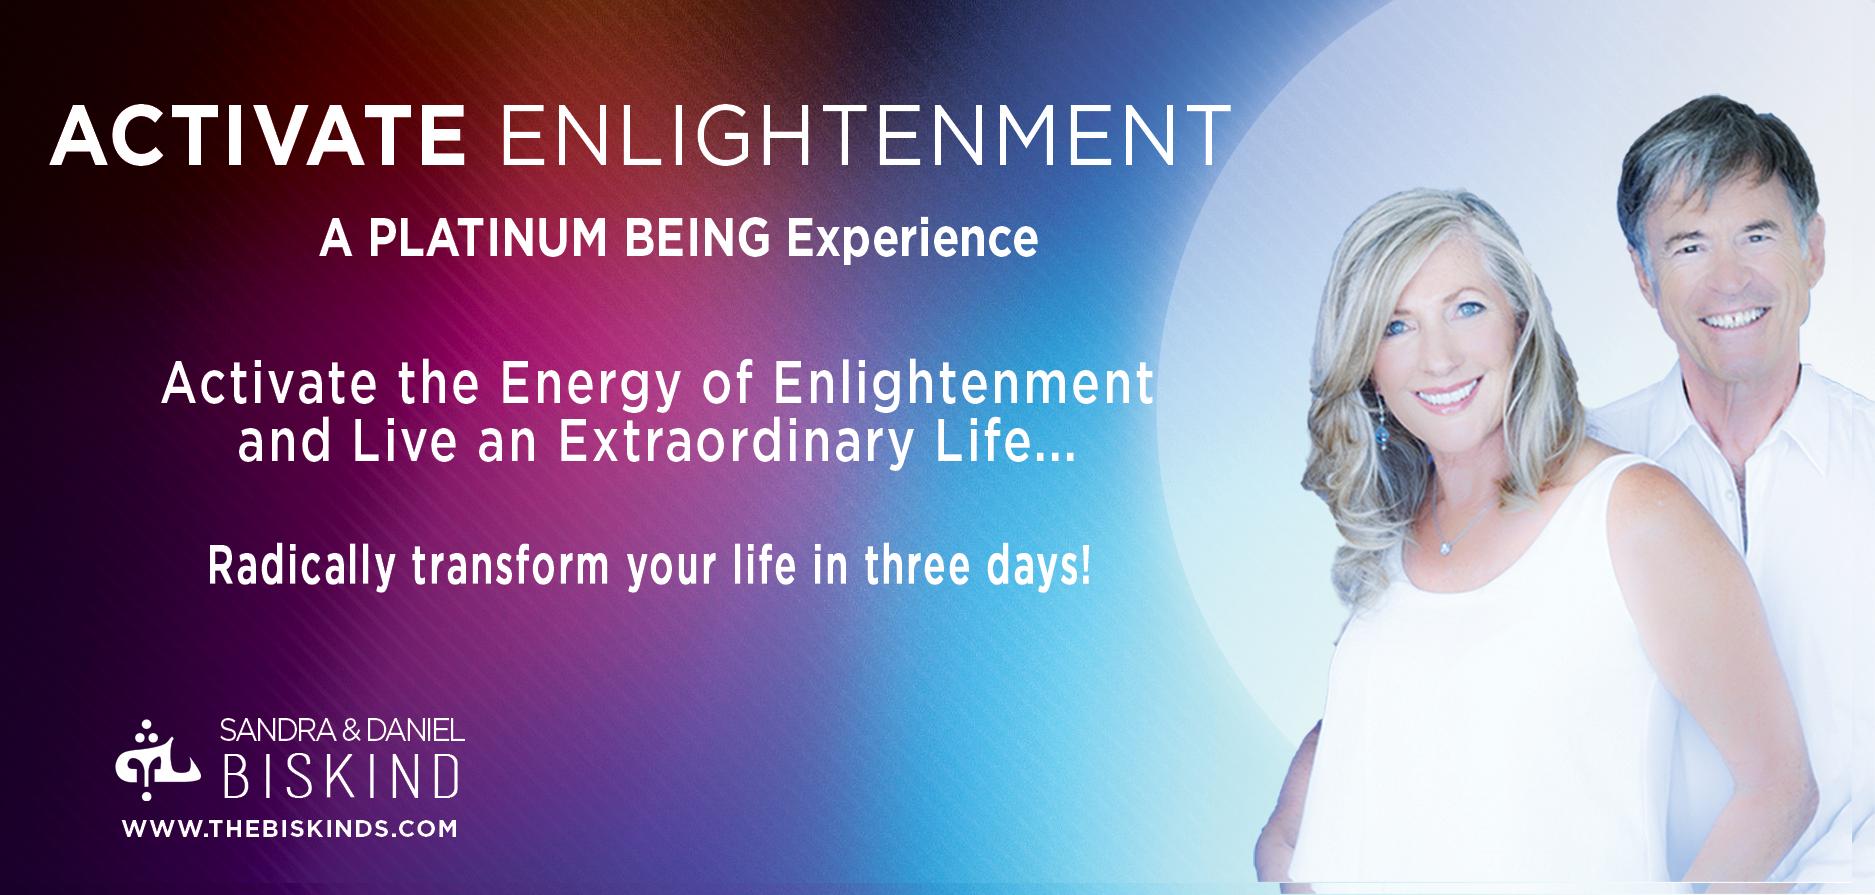 Home Activate enlightenment best seller live event image for website No best seller tag